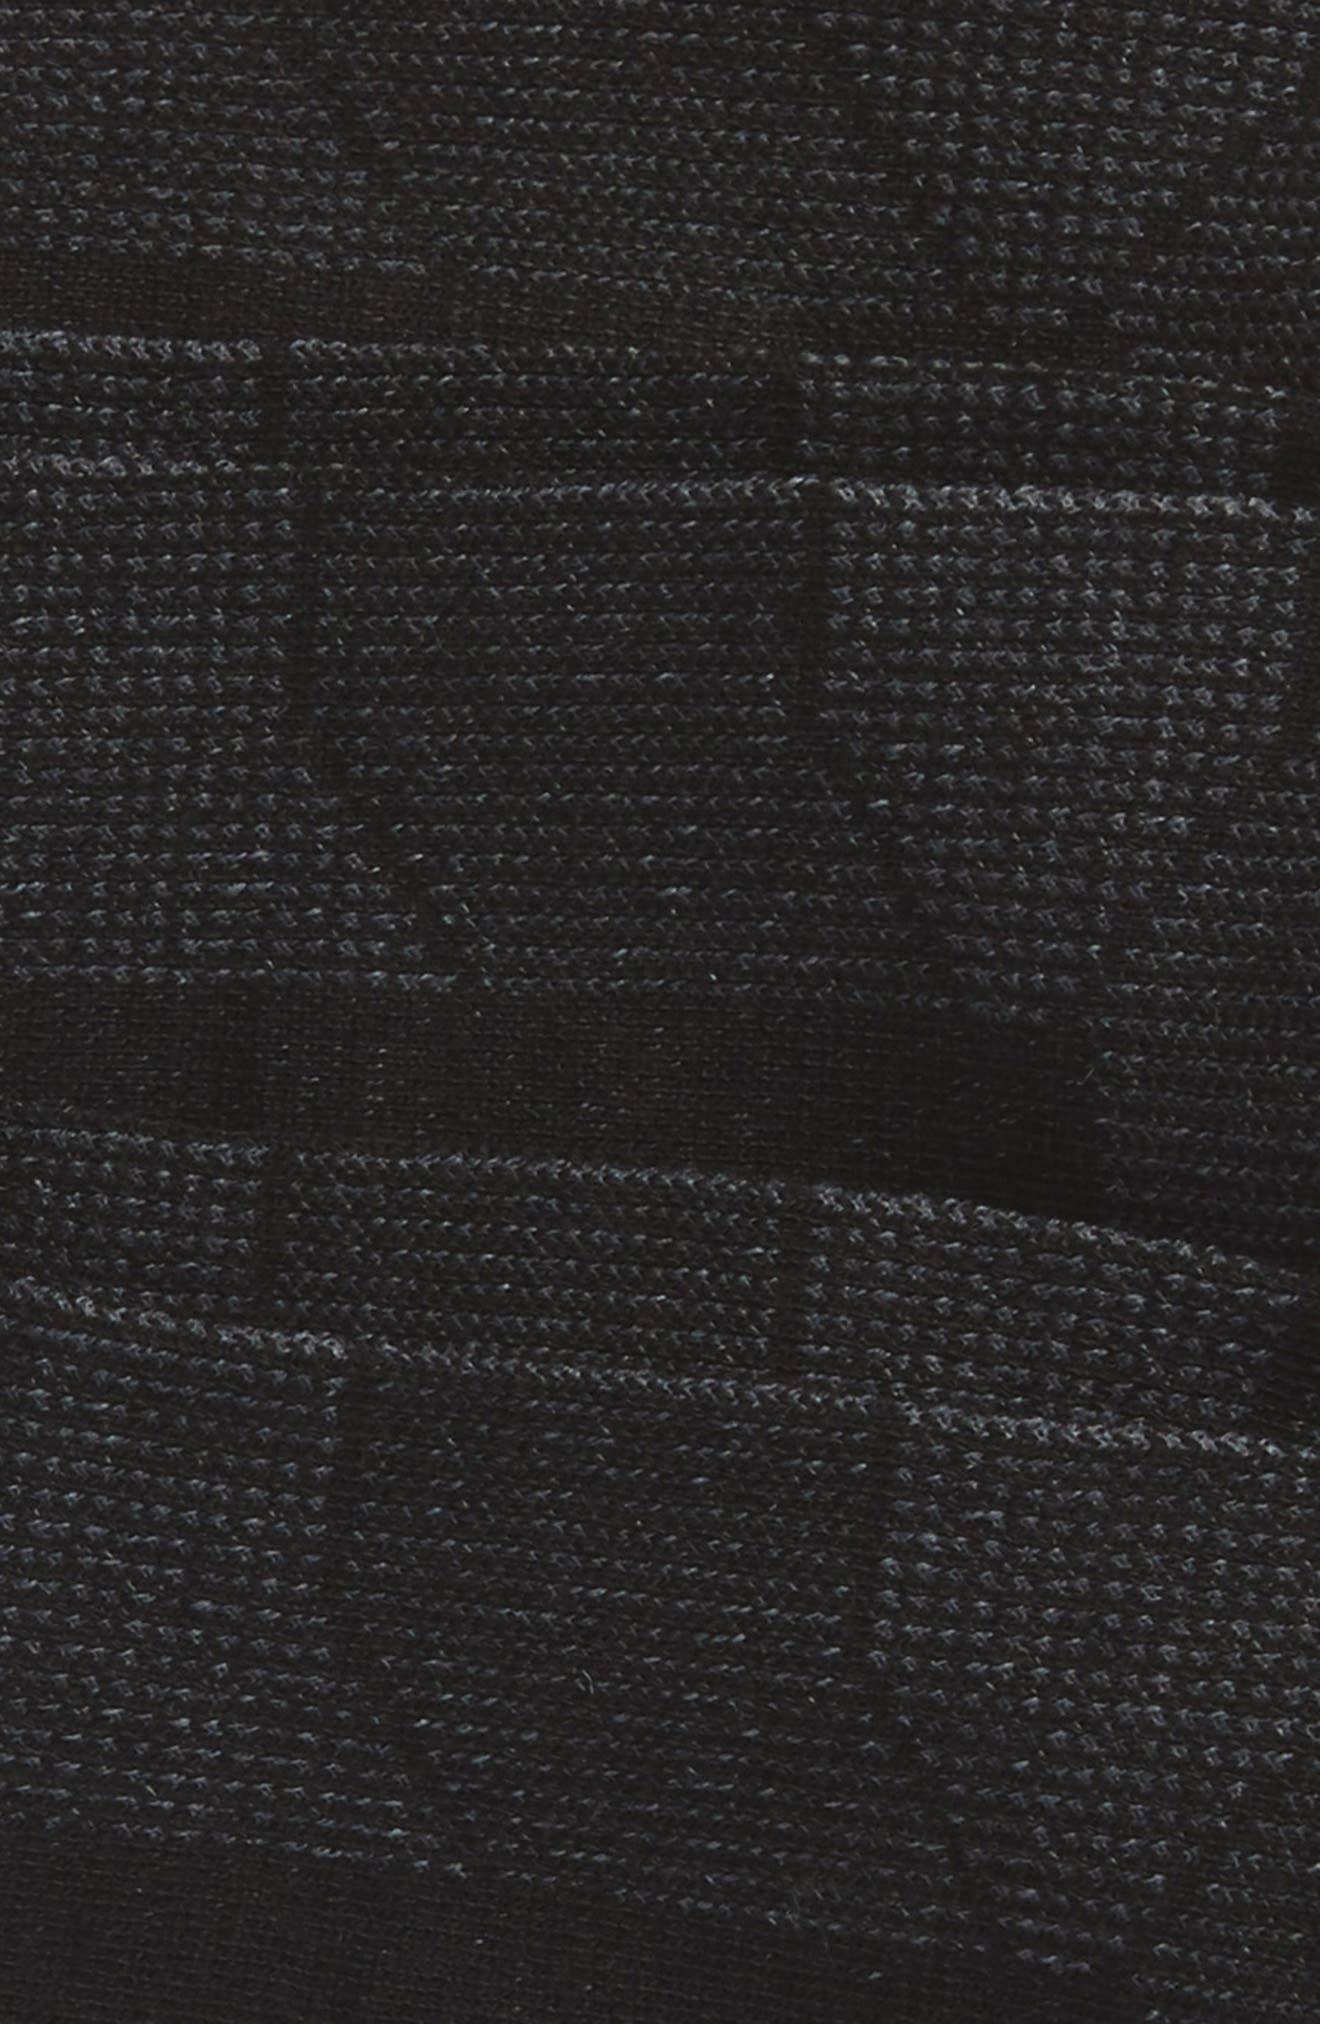 Prime Mesh I 3-Pack Socks,                             Alternate thumbnail 2, color,                             Black